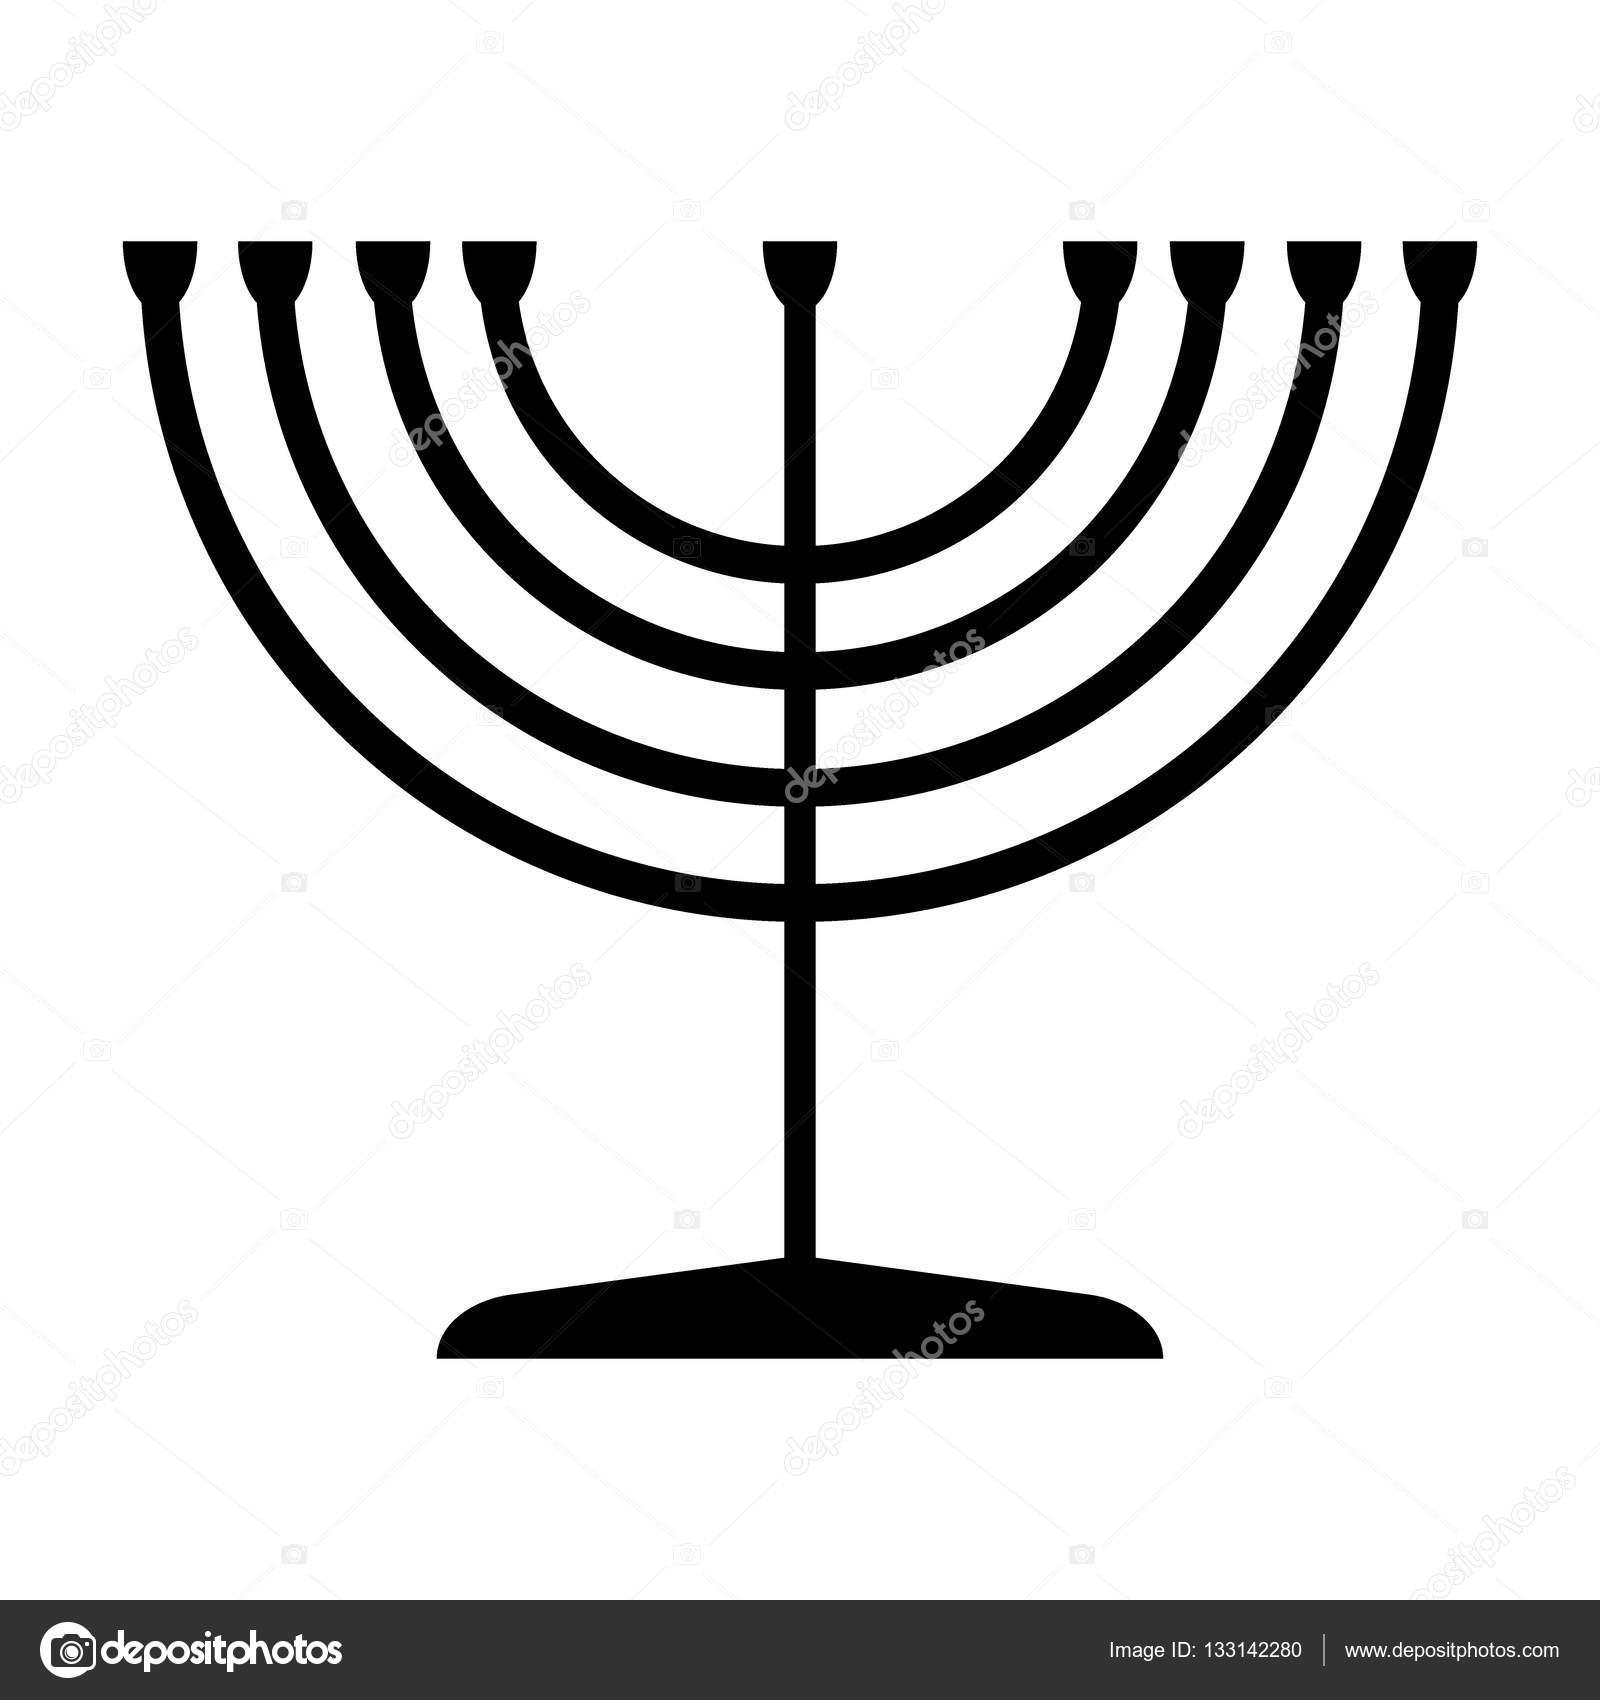 Menorah symbol of judaism stock vector rokvel 133142280 menorah symbol of judaism stock vector biocorpaavc Image collections